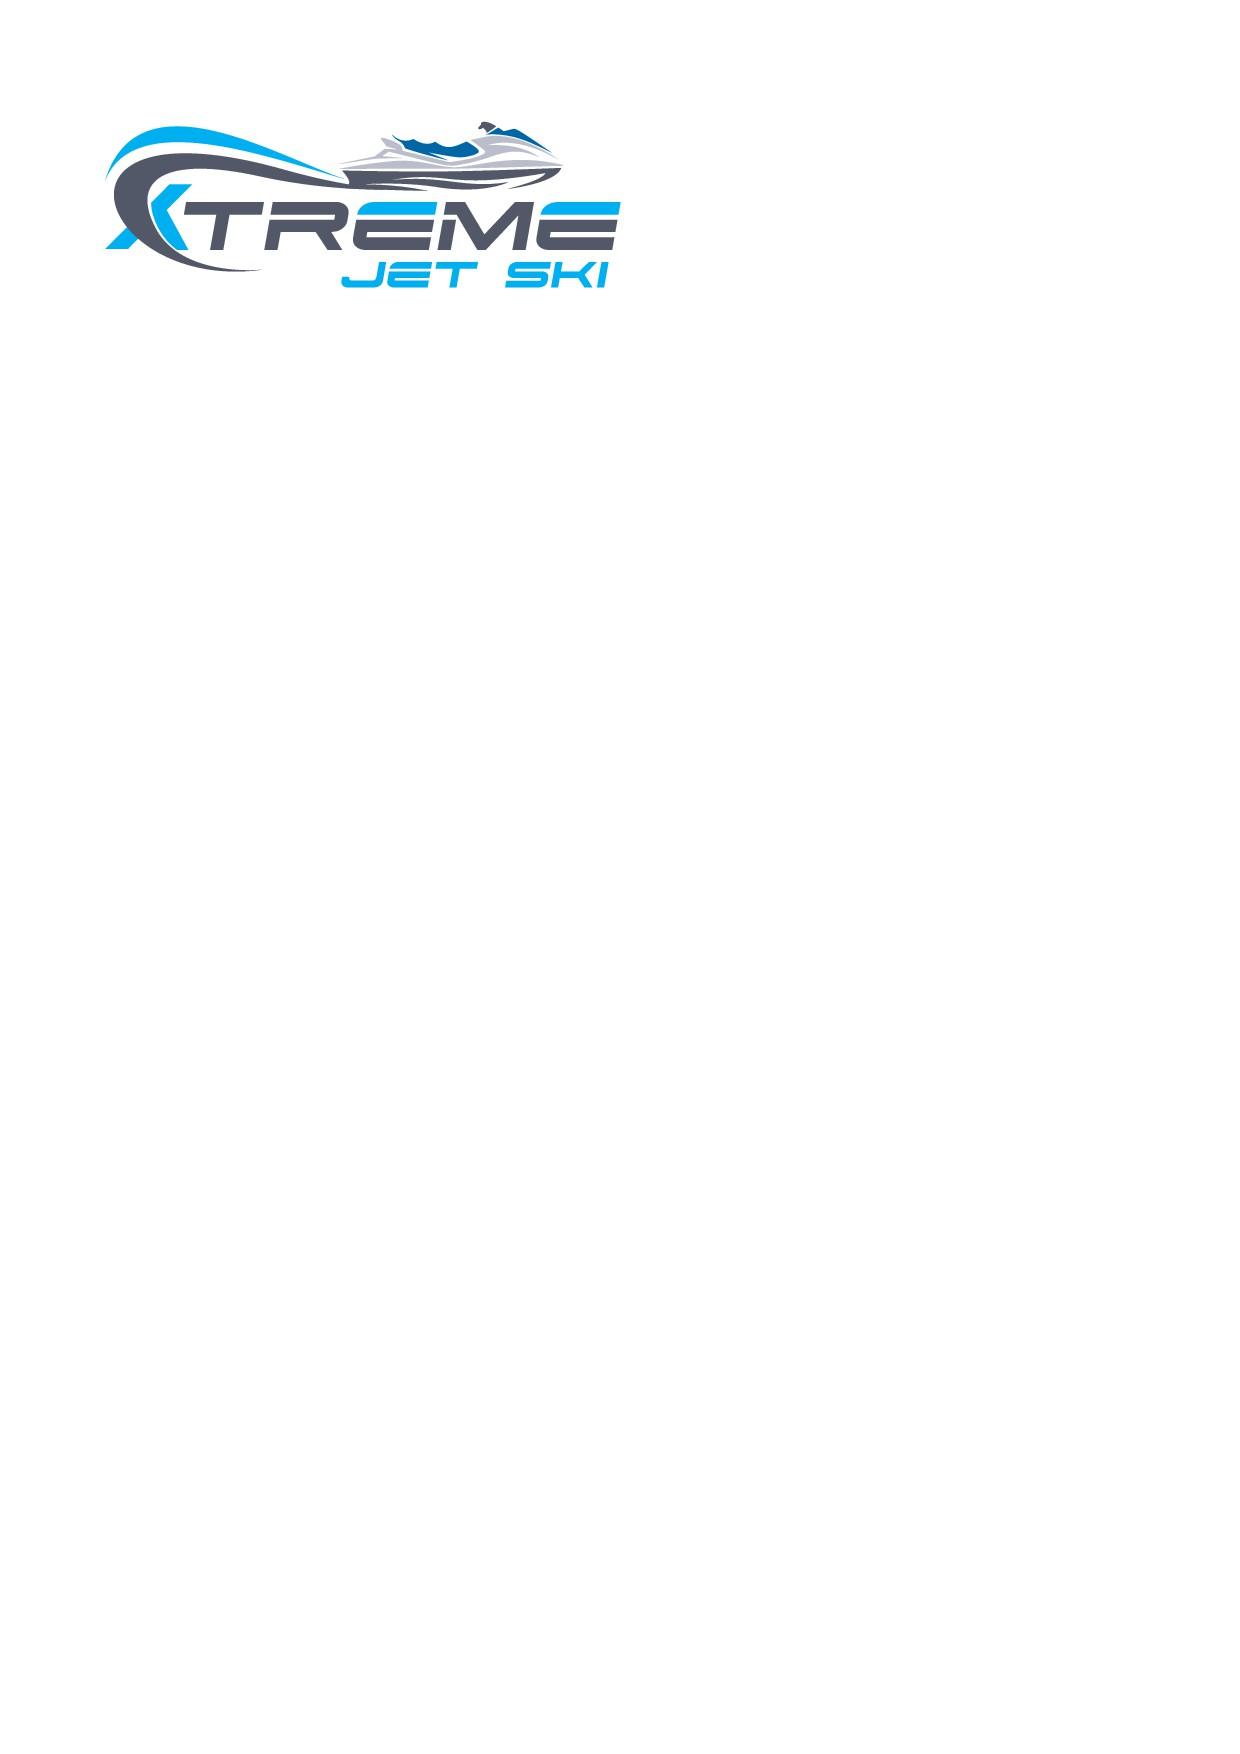 Design Jet ski rental logo